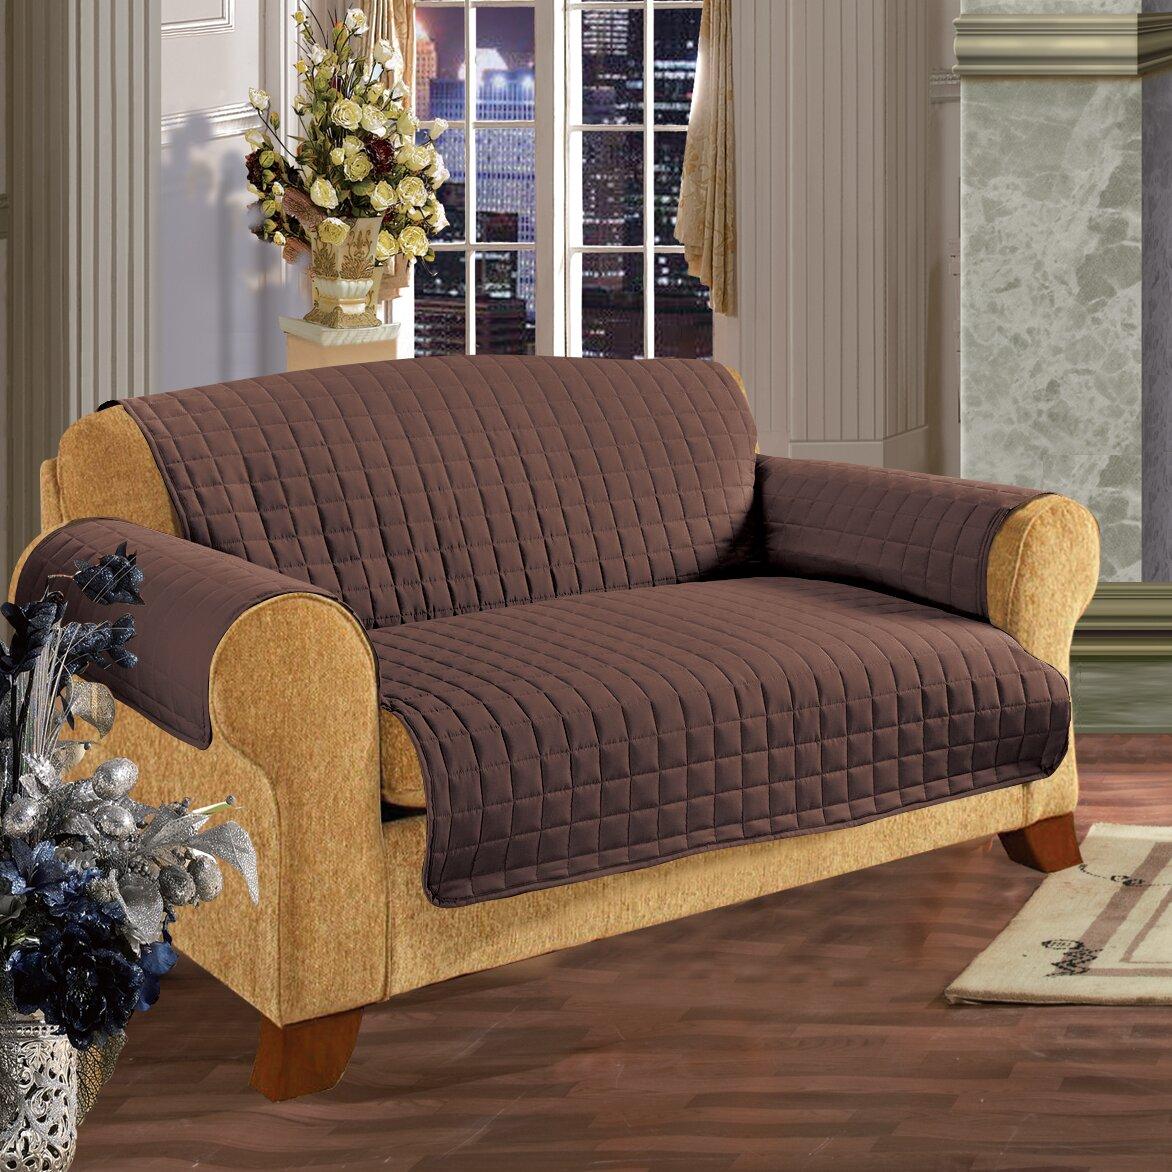 Elegant Comfort Loveseat T Cushion Slipcover Reviews Wayfair